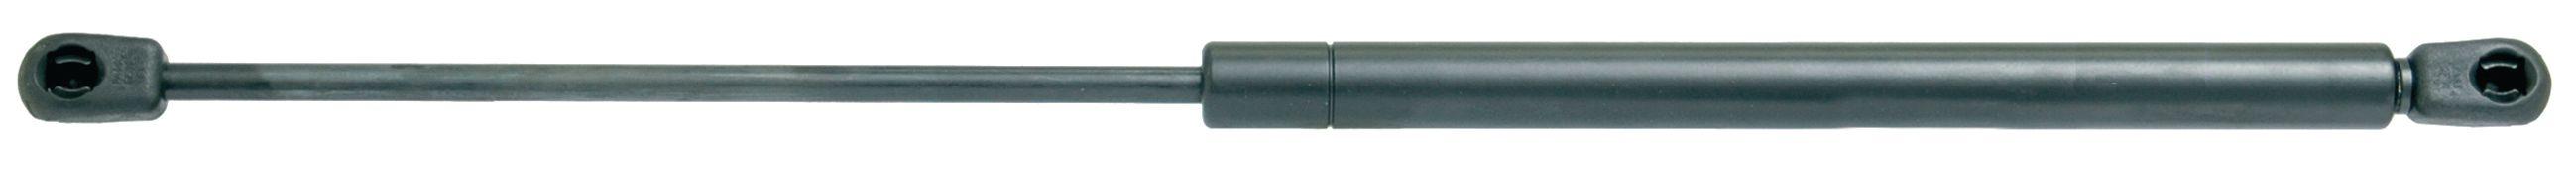 MCCORMICK GAS STRUT 52906